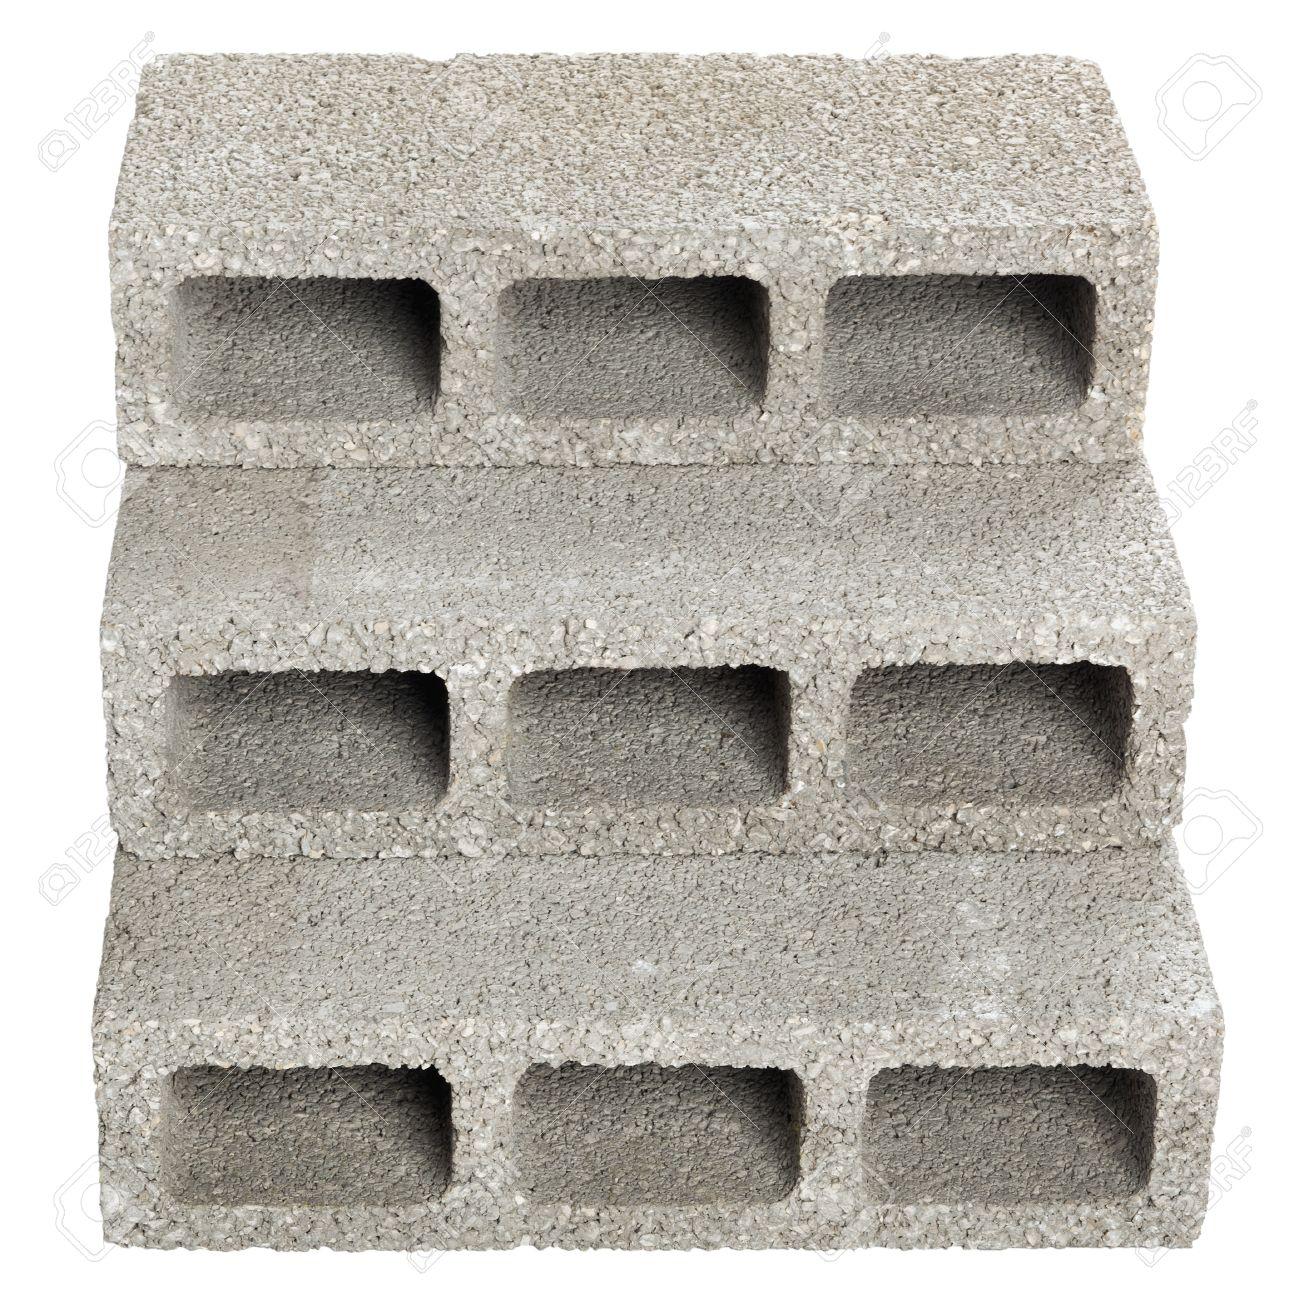 Attractive Three Gray Concrete Construction Blocks (a.k.a. Cinder Block, Breeze Block,  Cement Block,